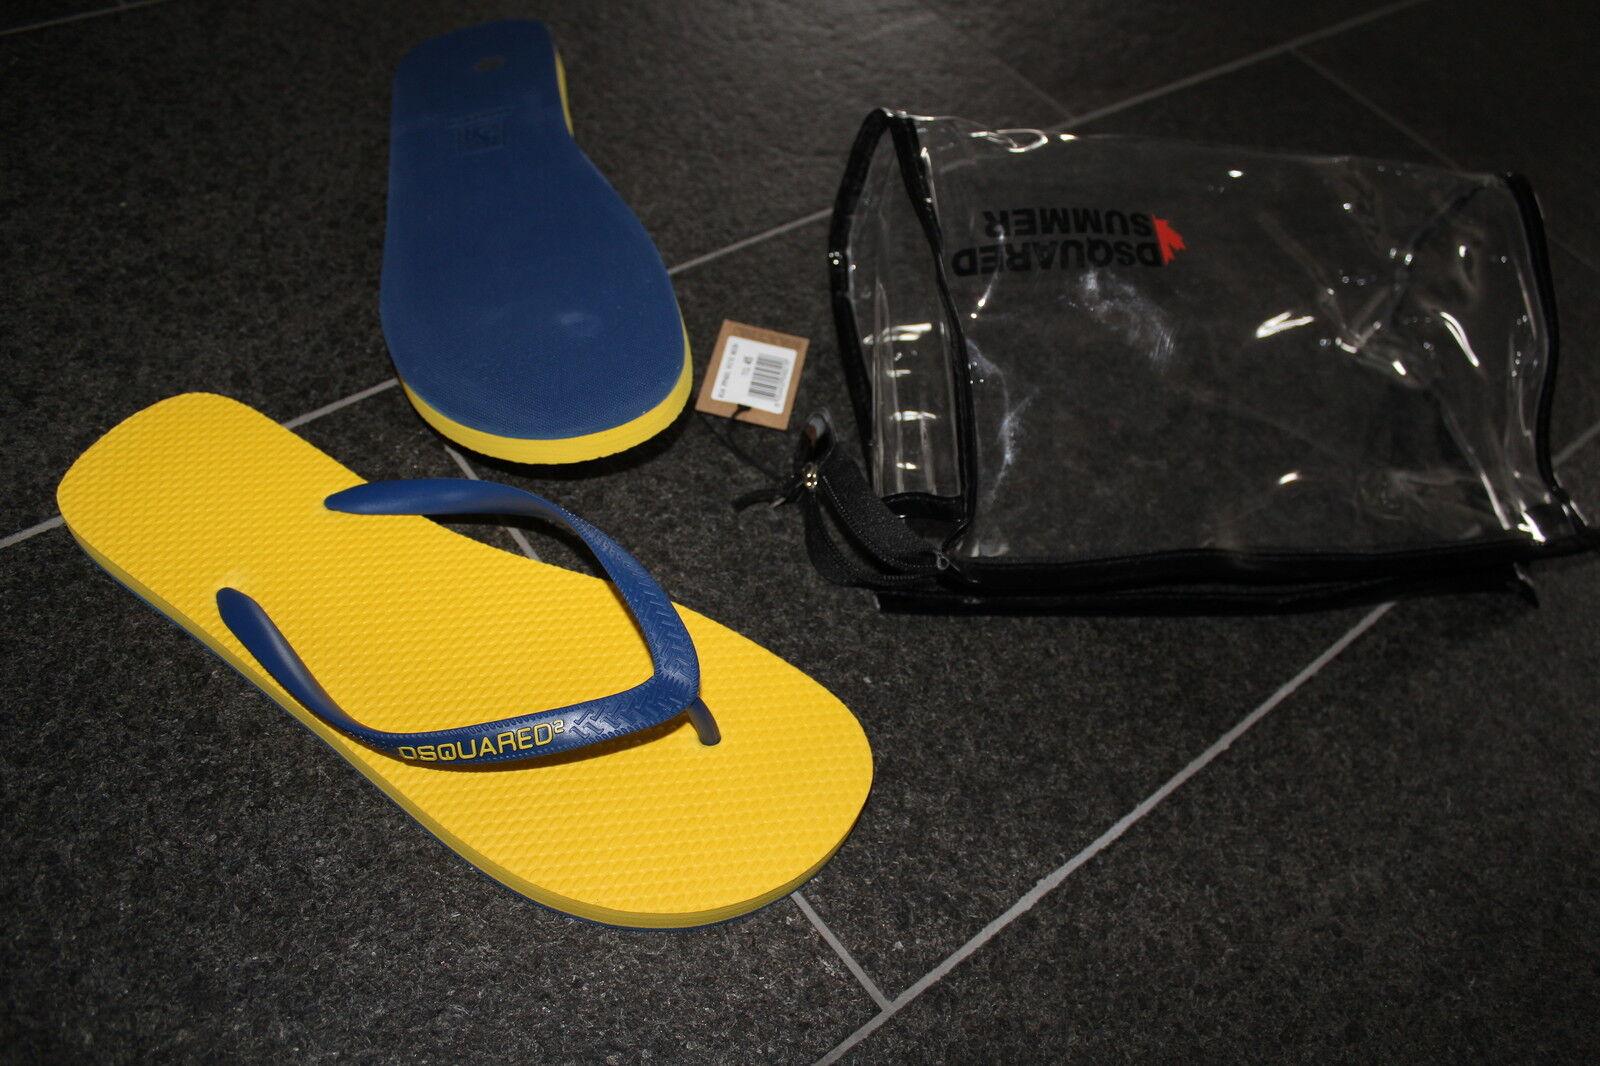 Dsquarojo 2 S s 2015 Chanclas Baño sandalias zapatillas zapatos 45 zapatos Sandals